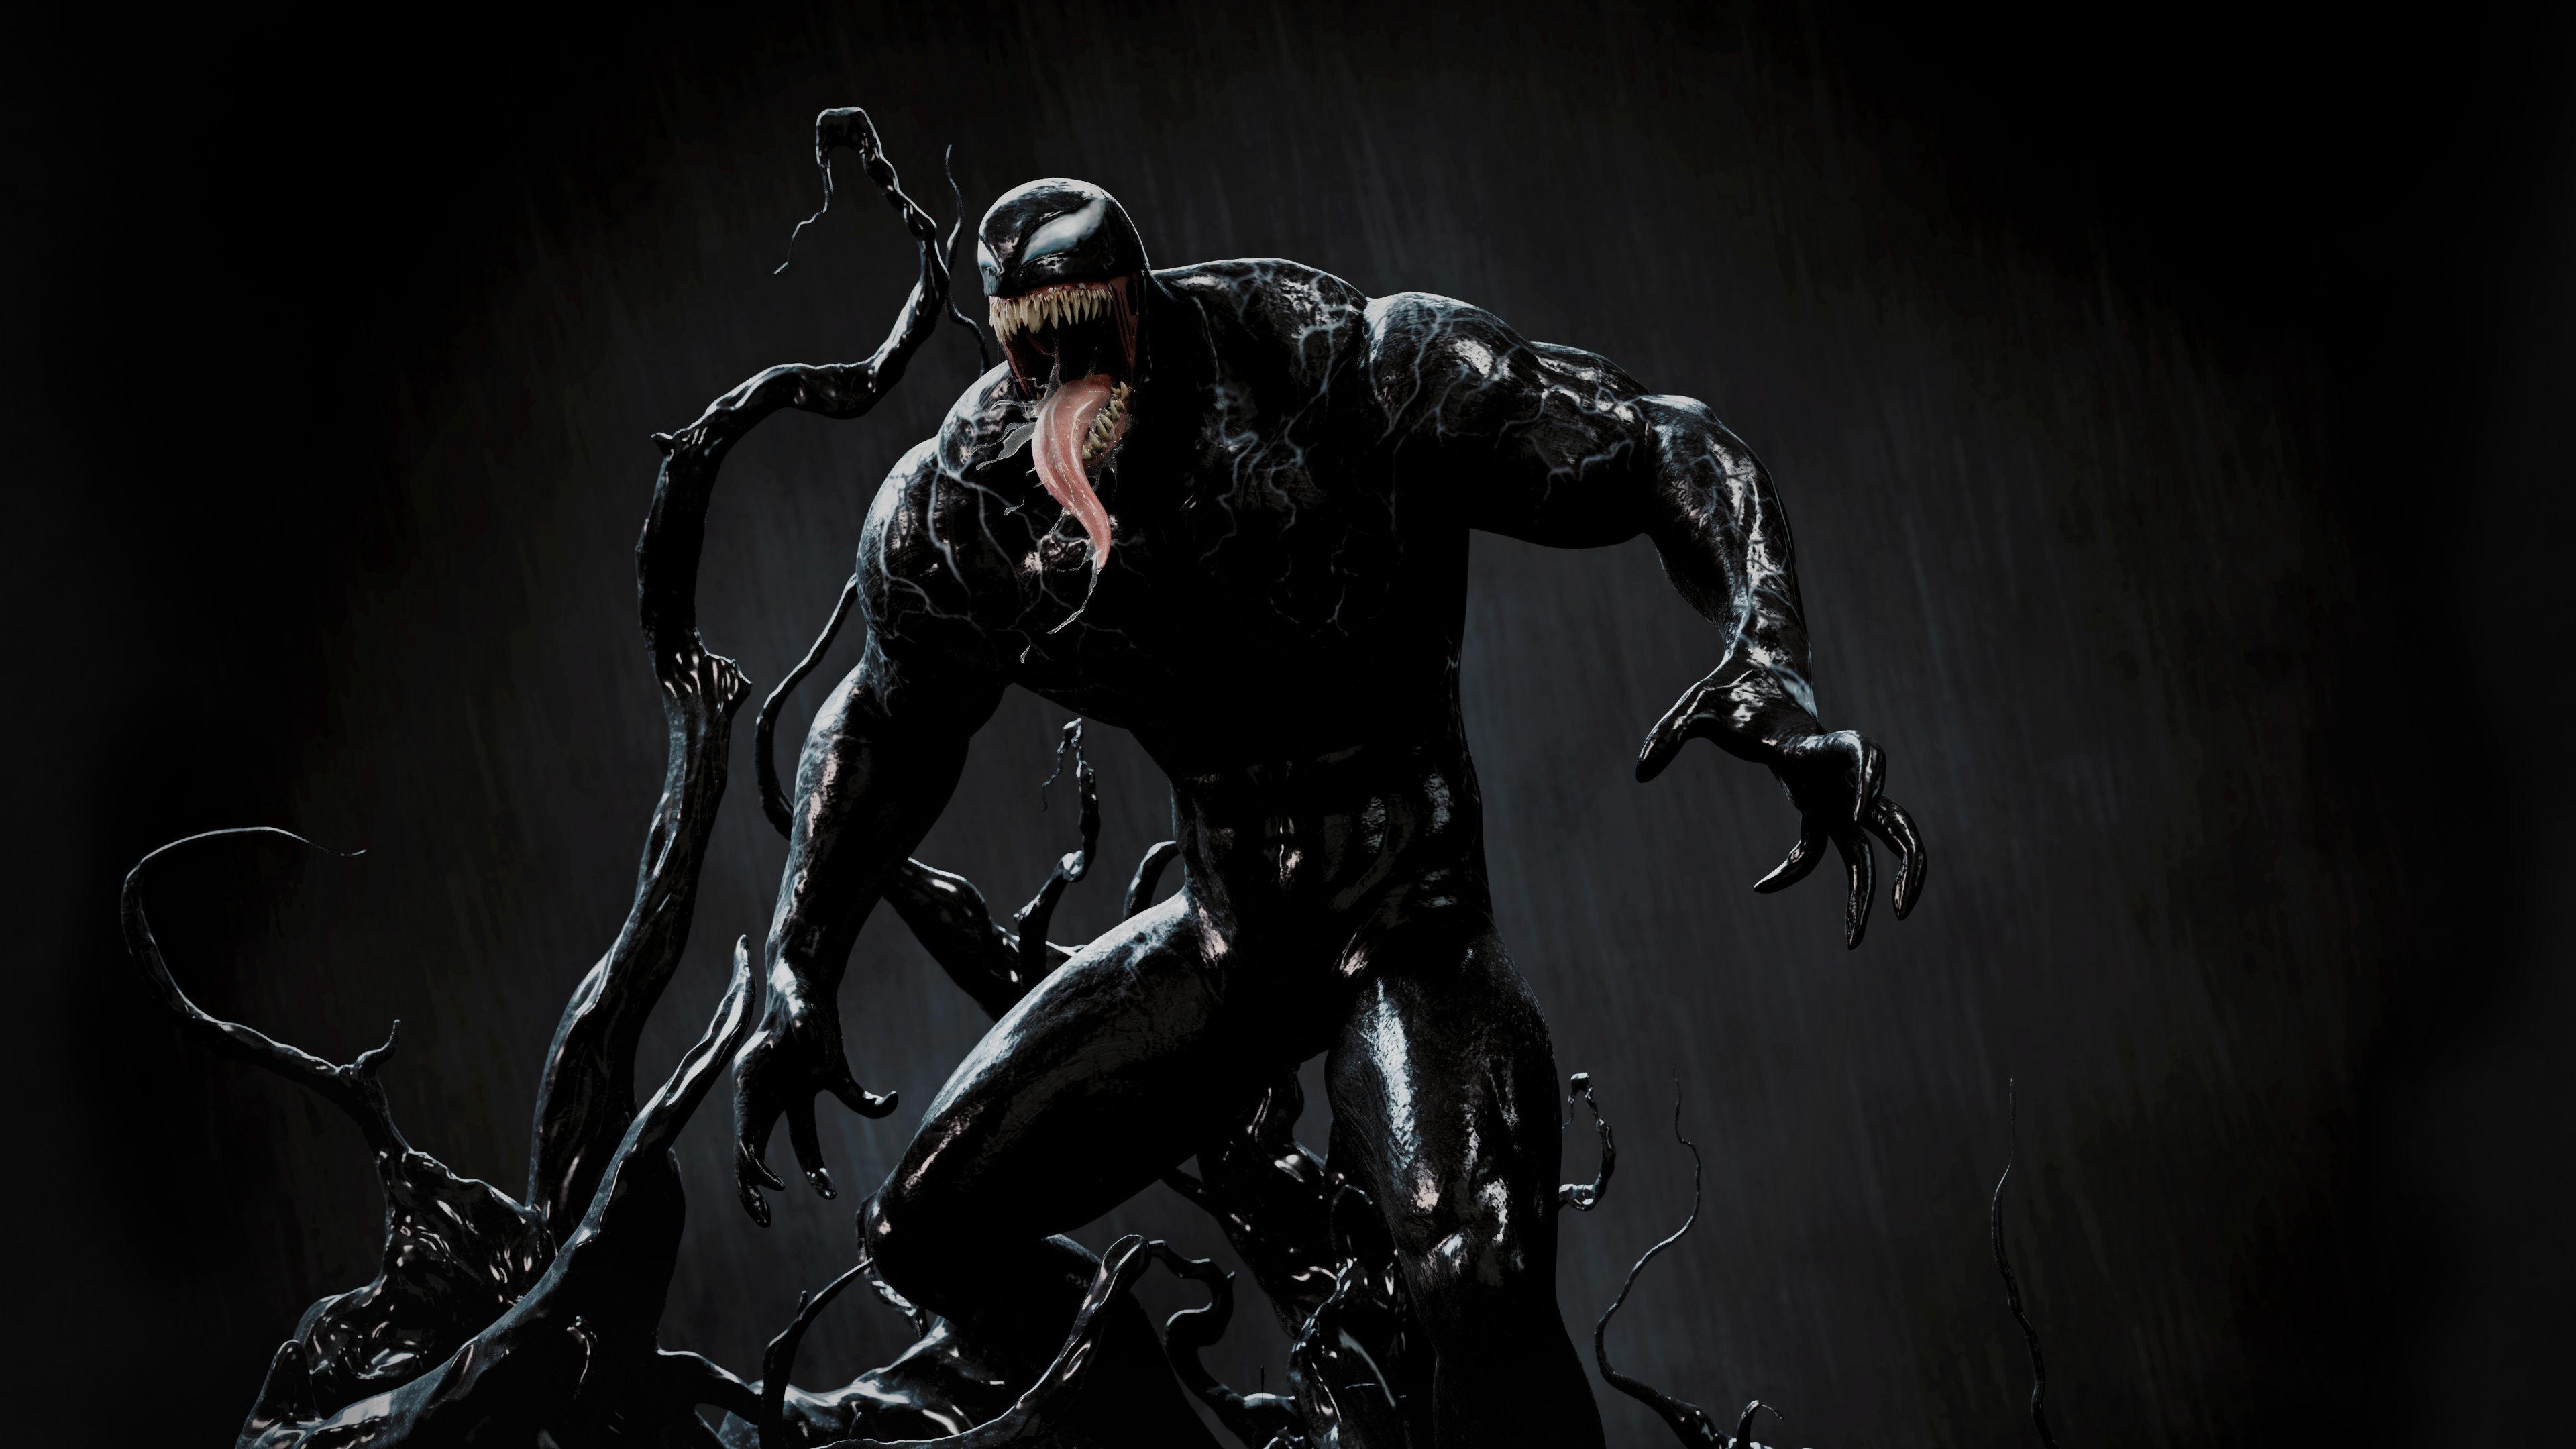 Venom Wake Up Again 4k Venom Wallpapers Superheroes Wallpapers Hd